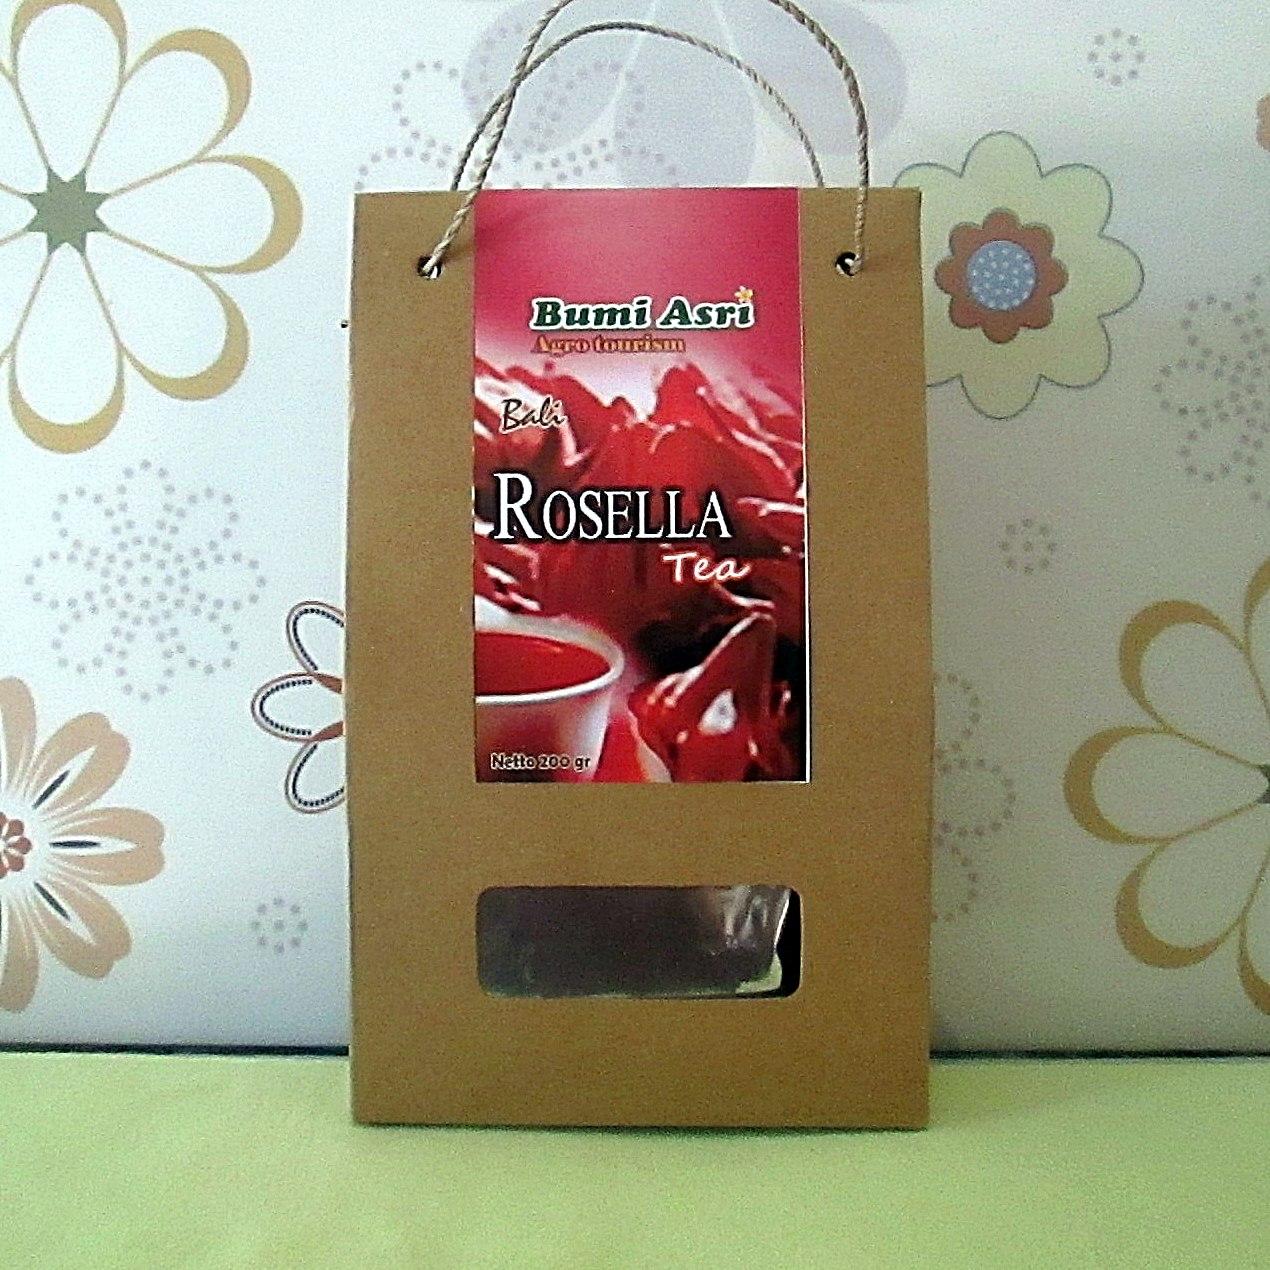 Rosella Flower Tea Powder 200 gram - bumi asri bali